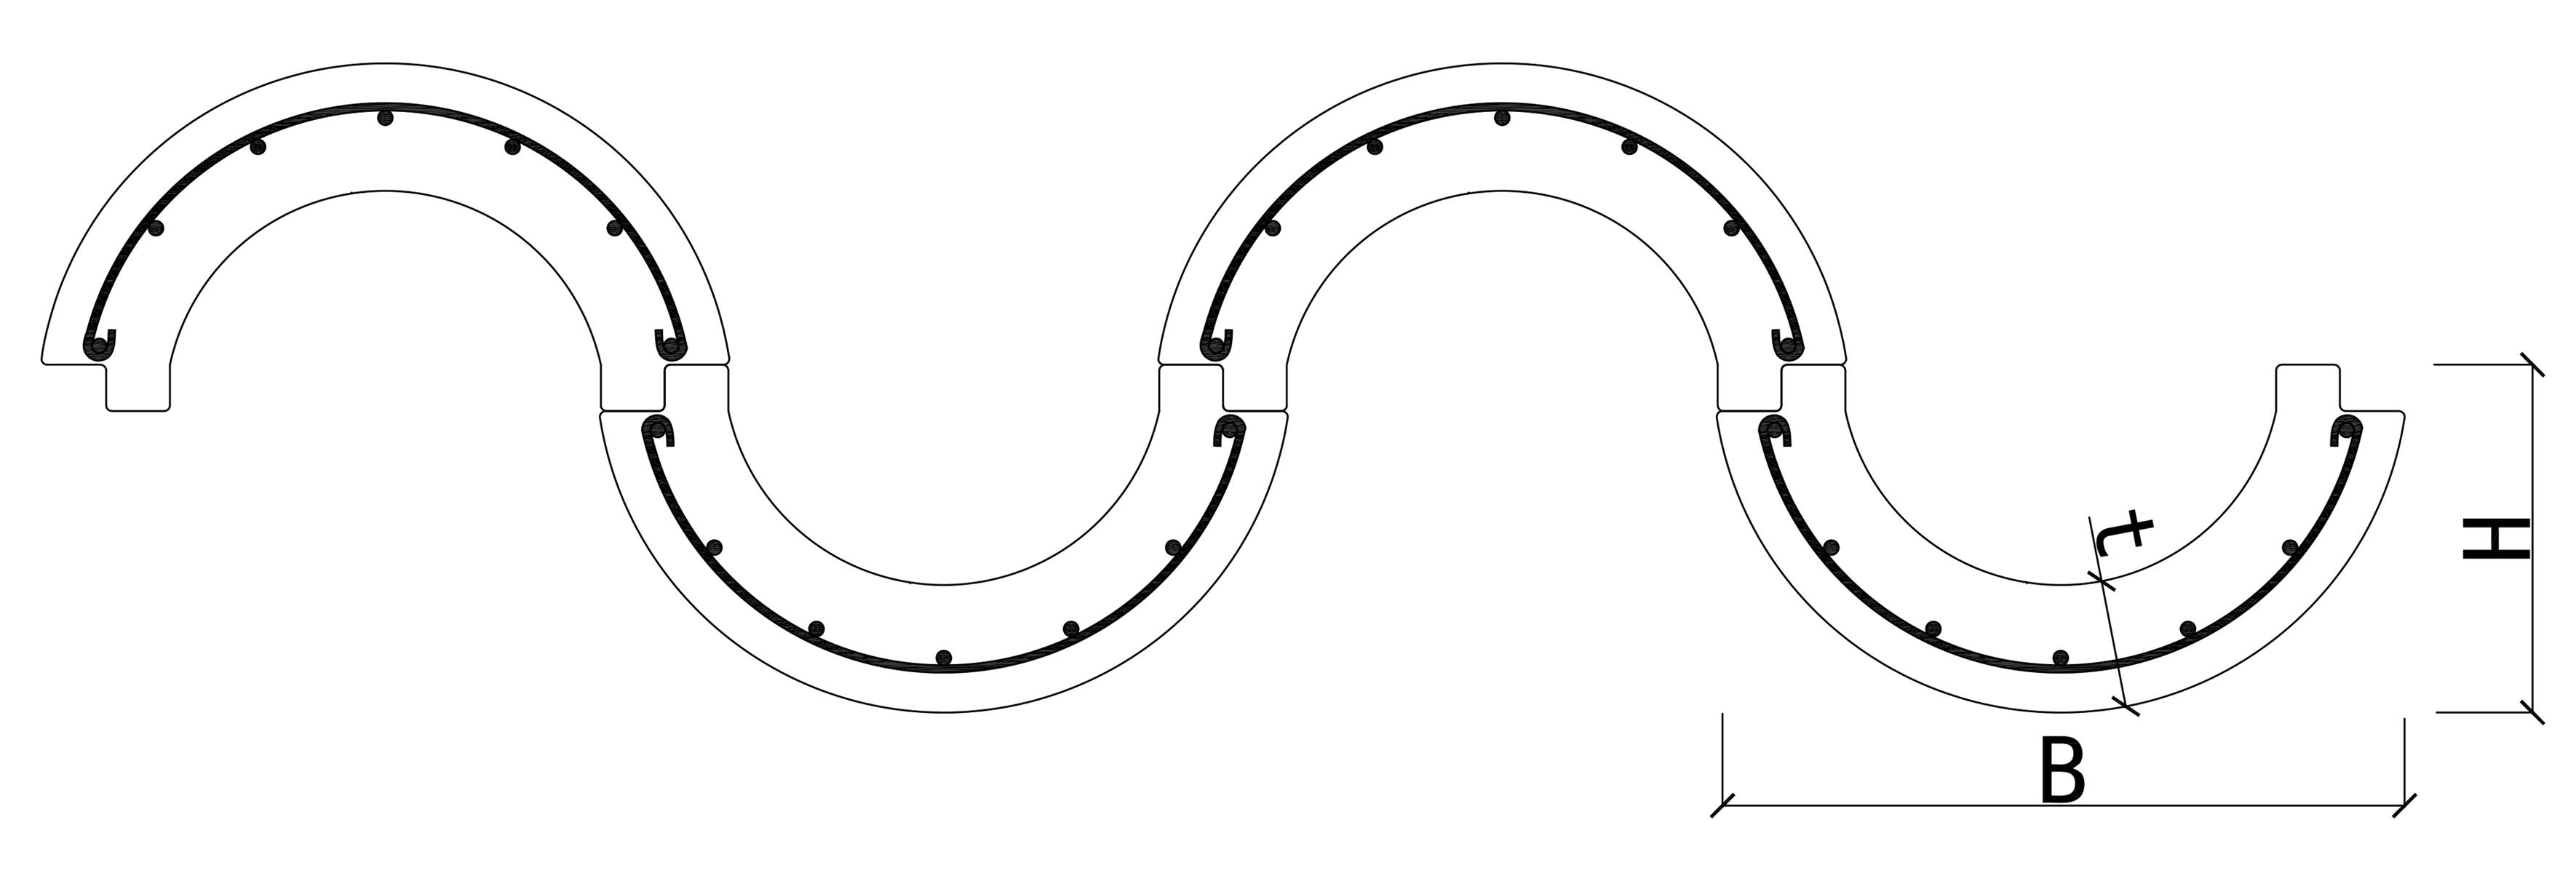 S形截面拼裝方式.jpg